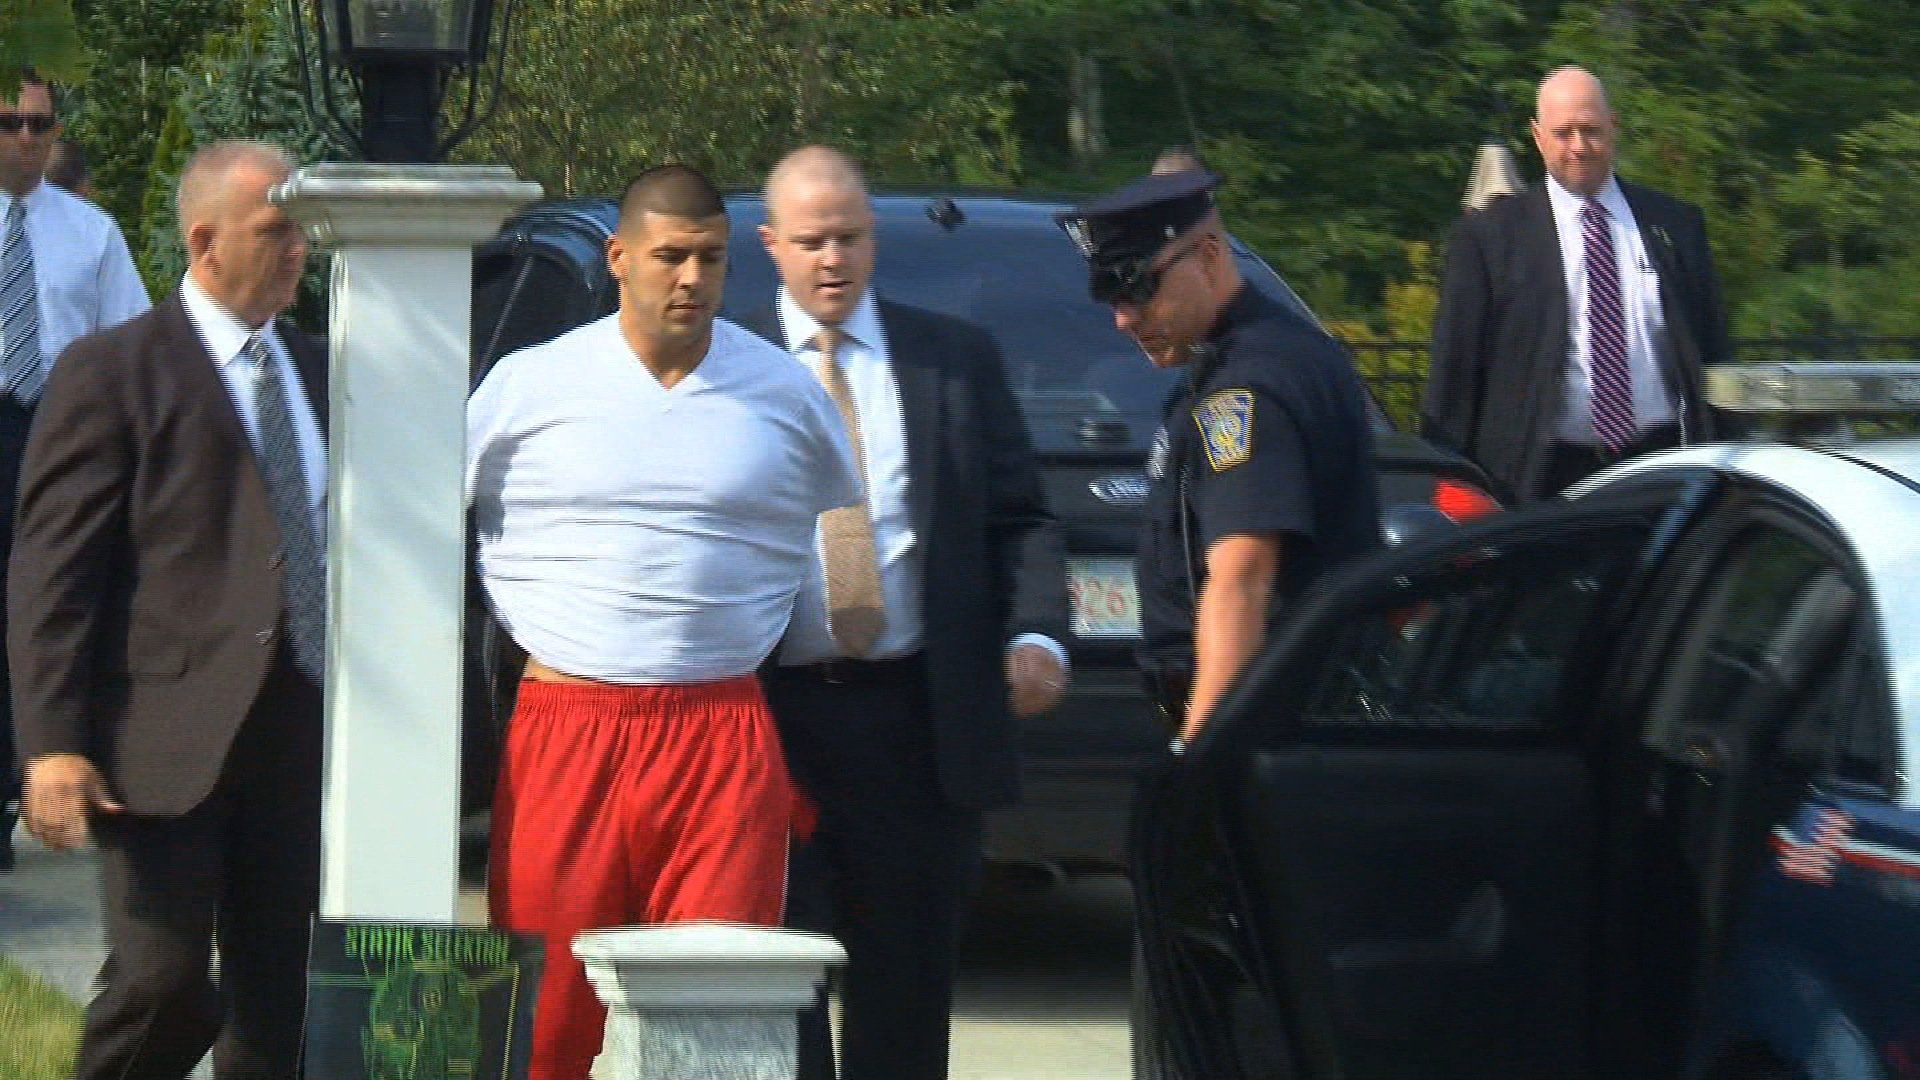 Patriots'Hernandez taken into custody amid investigation of man's death